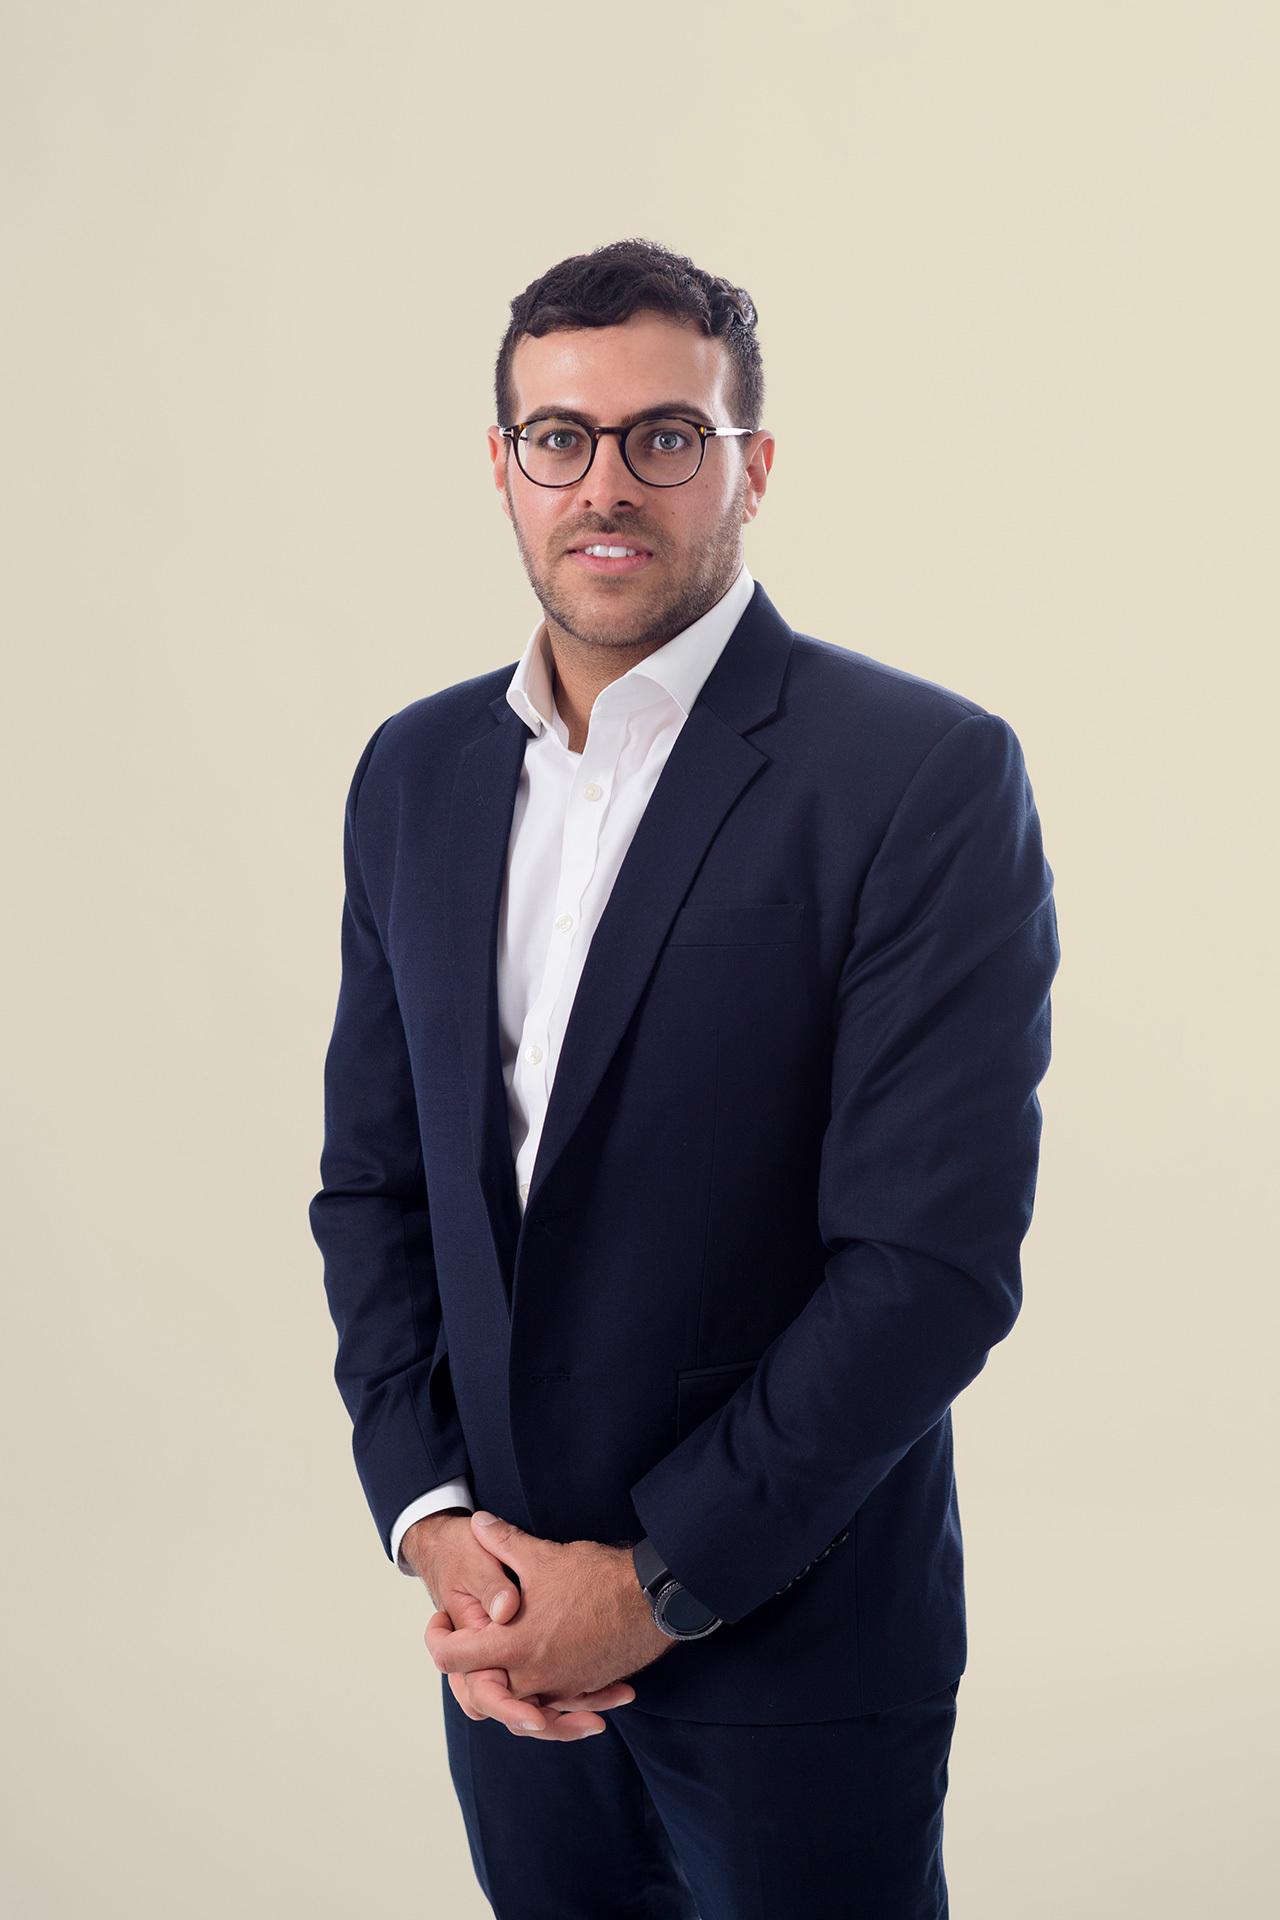 Justin Khoury